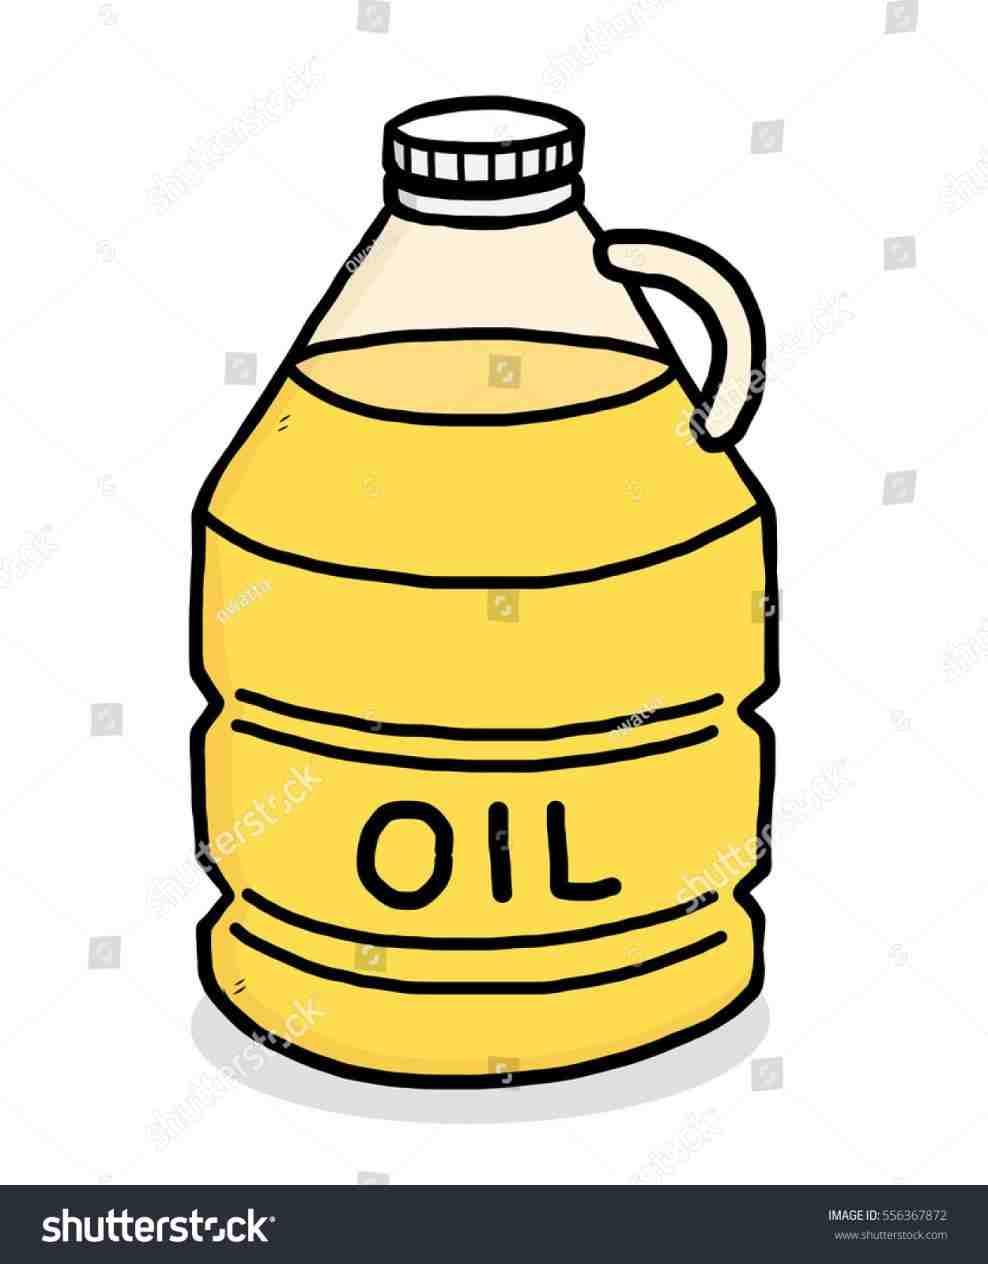 Vegetable Cooking Oil Clipart oil bottle cartoon » Clipart.